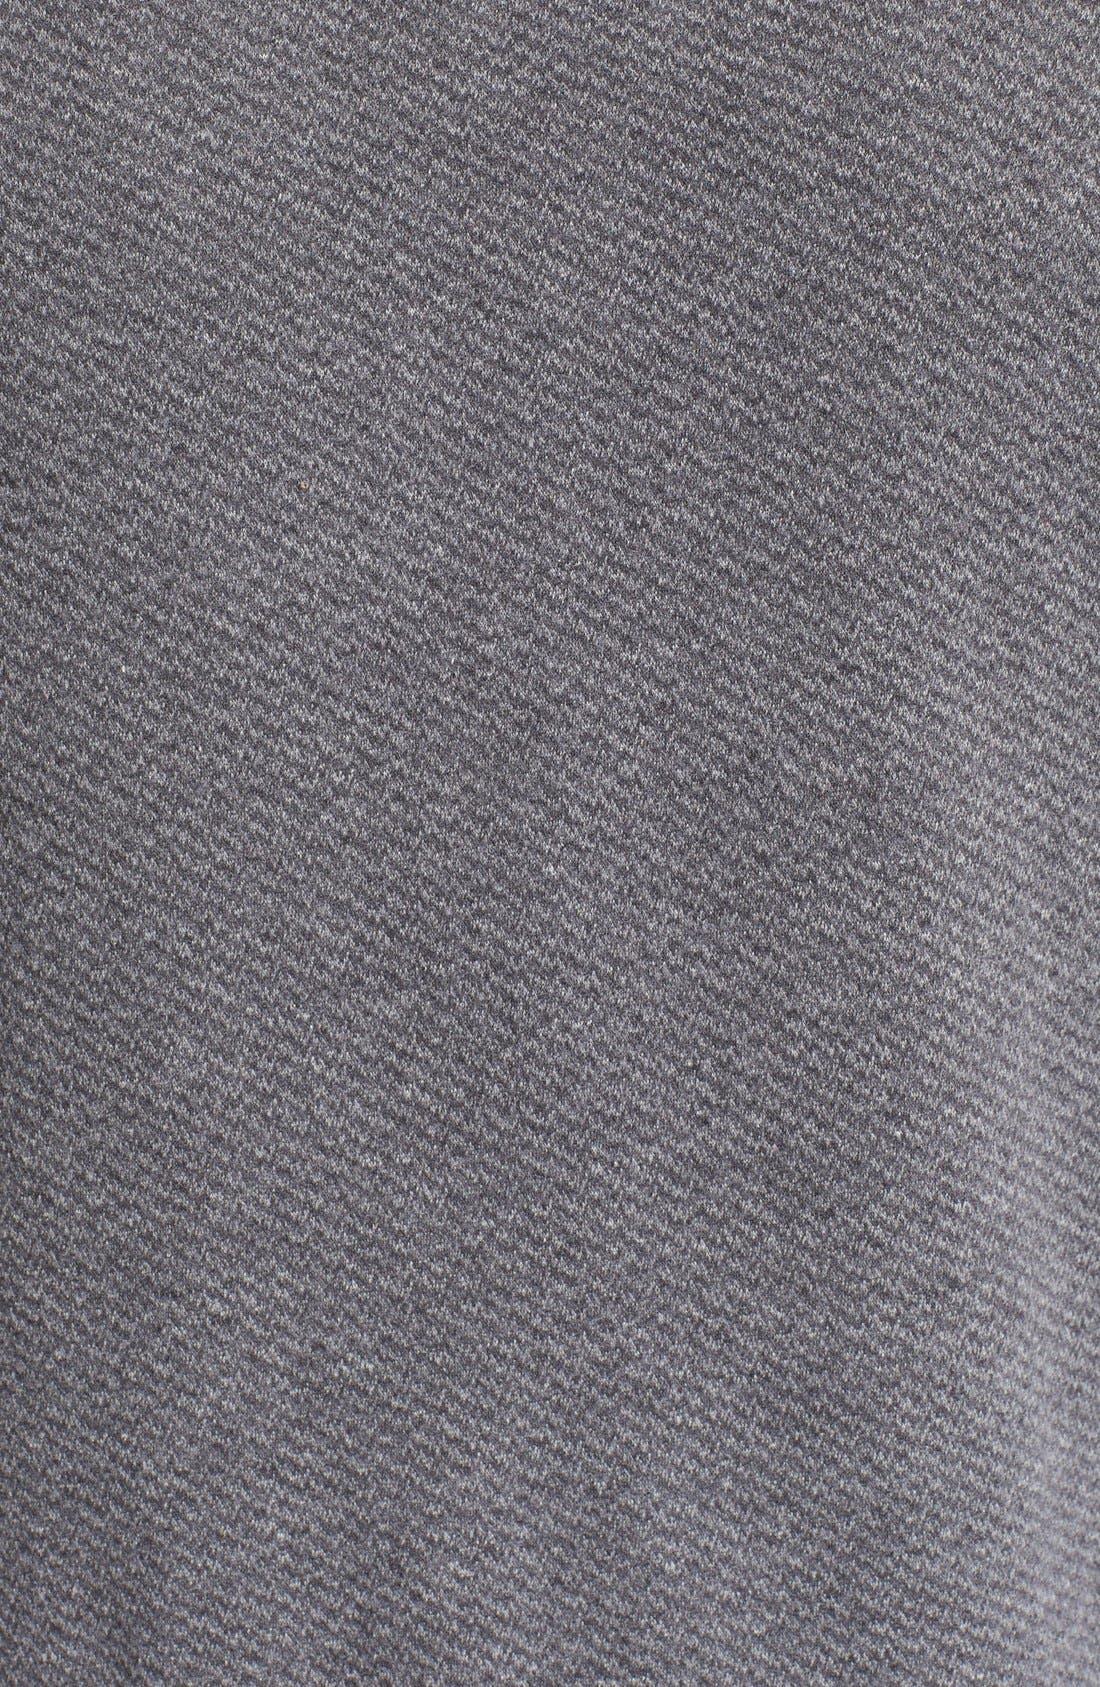 POLO RALPH LAUREN,                             Shawl Collar Sweater,                             Alternate thumbnail 2, color,                             020